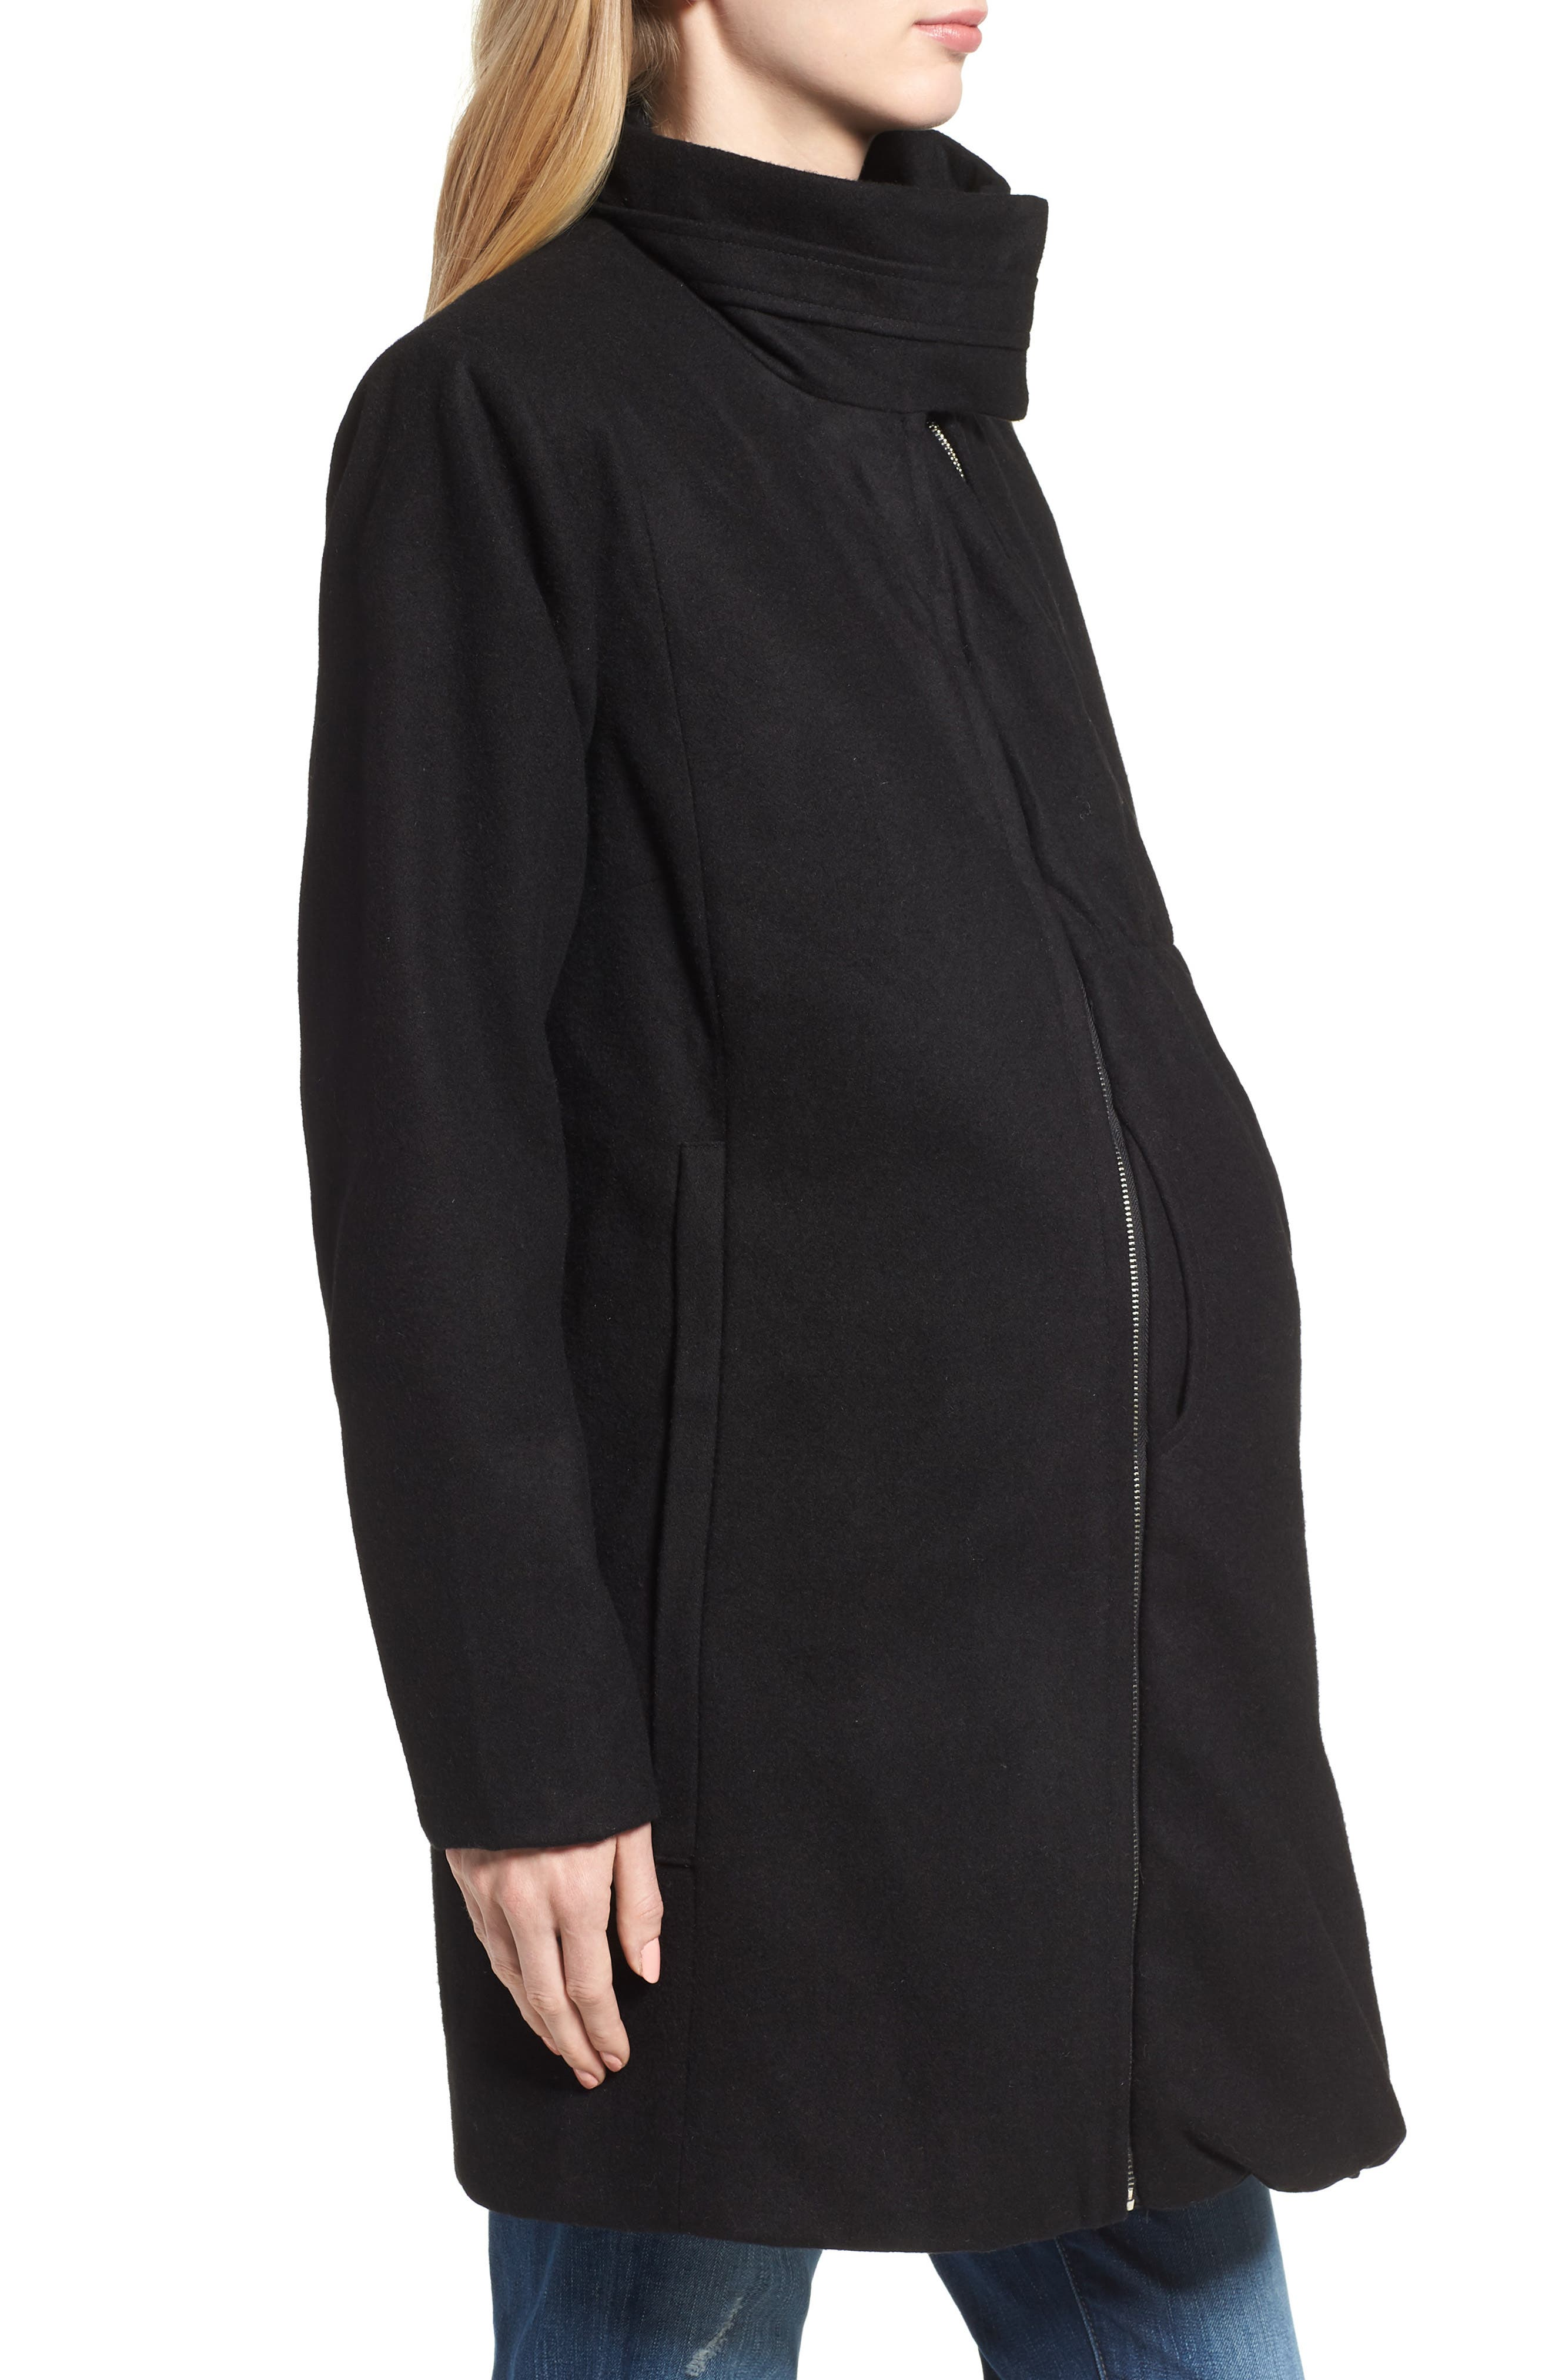 Convertible 3-in-1 Maternity/Nursing Coat,                             Alternate thumbnail 5, color,                             BLACK